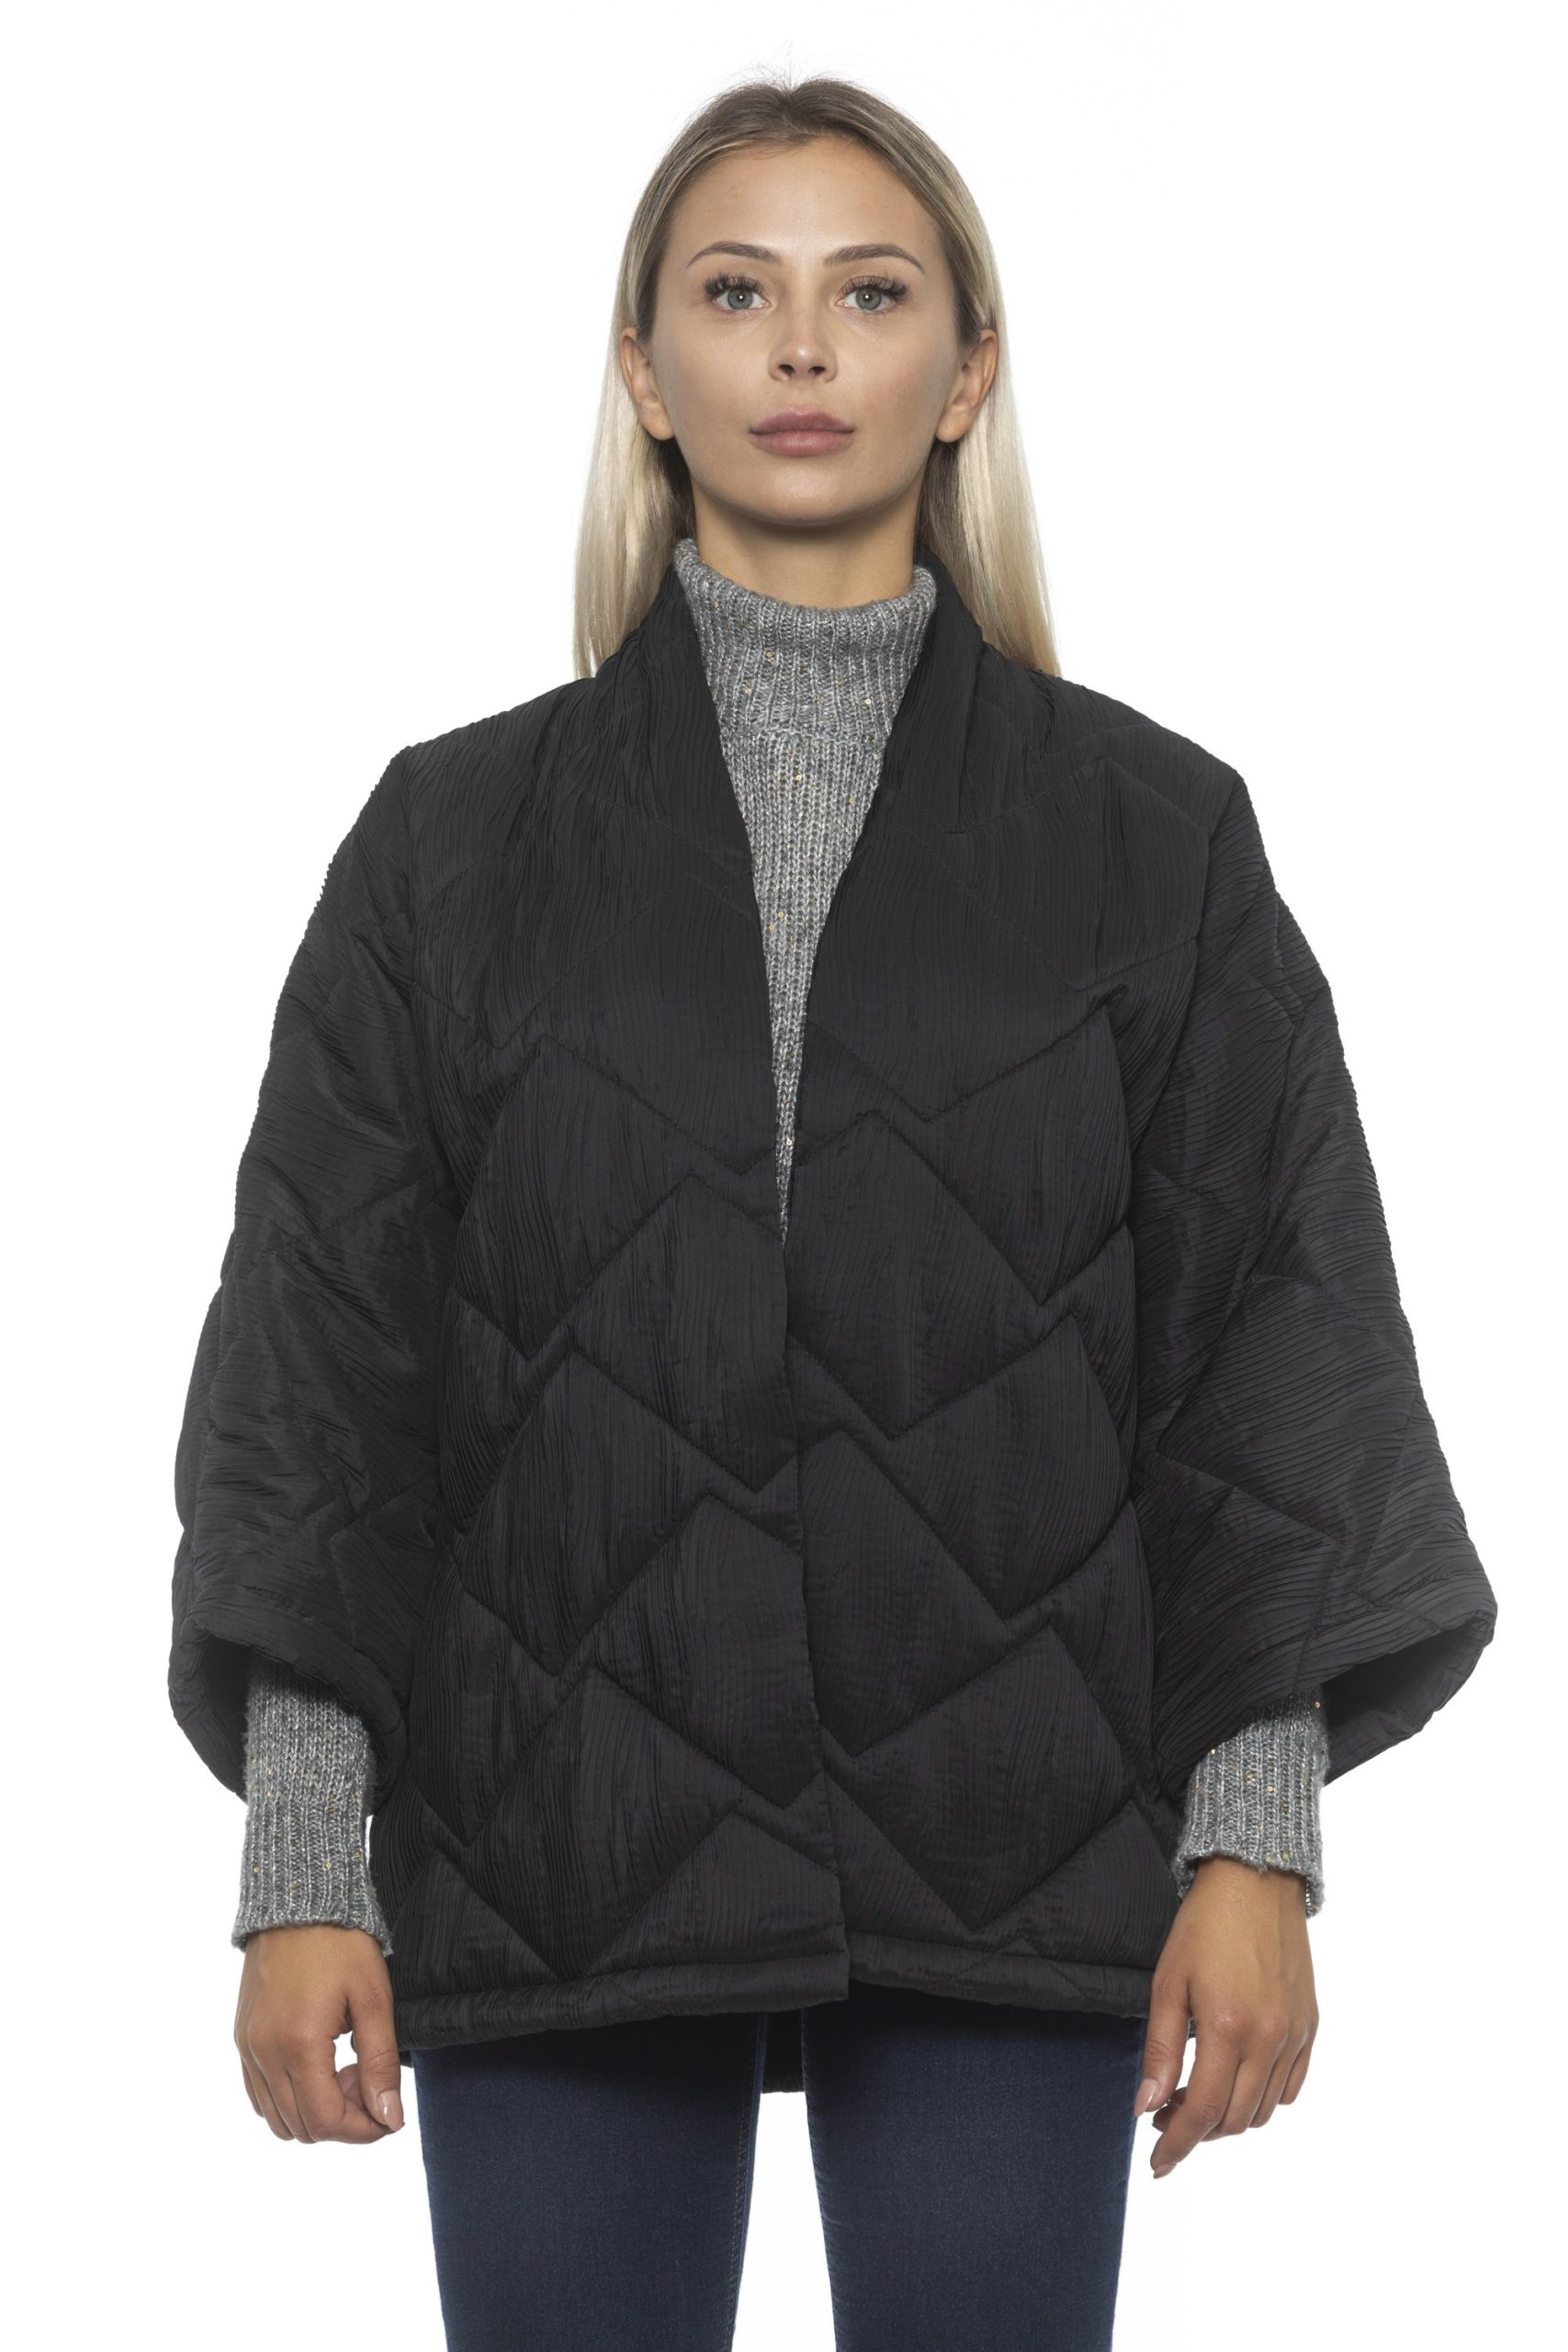 Alpha Studio Women's V A R. U N I C A Coat Black AL1192244 - One Size